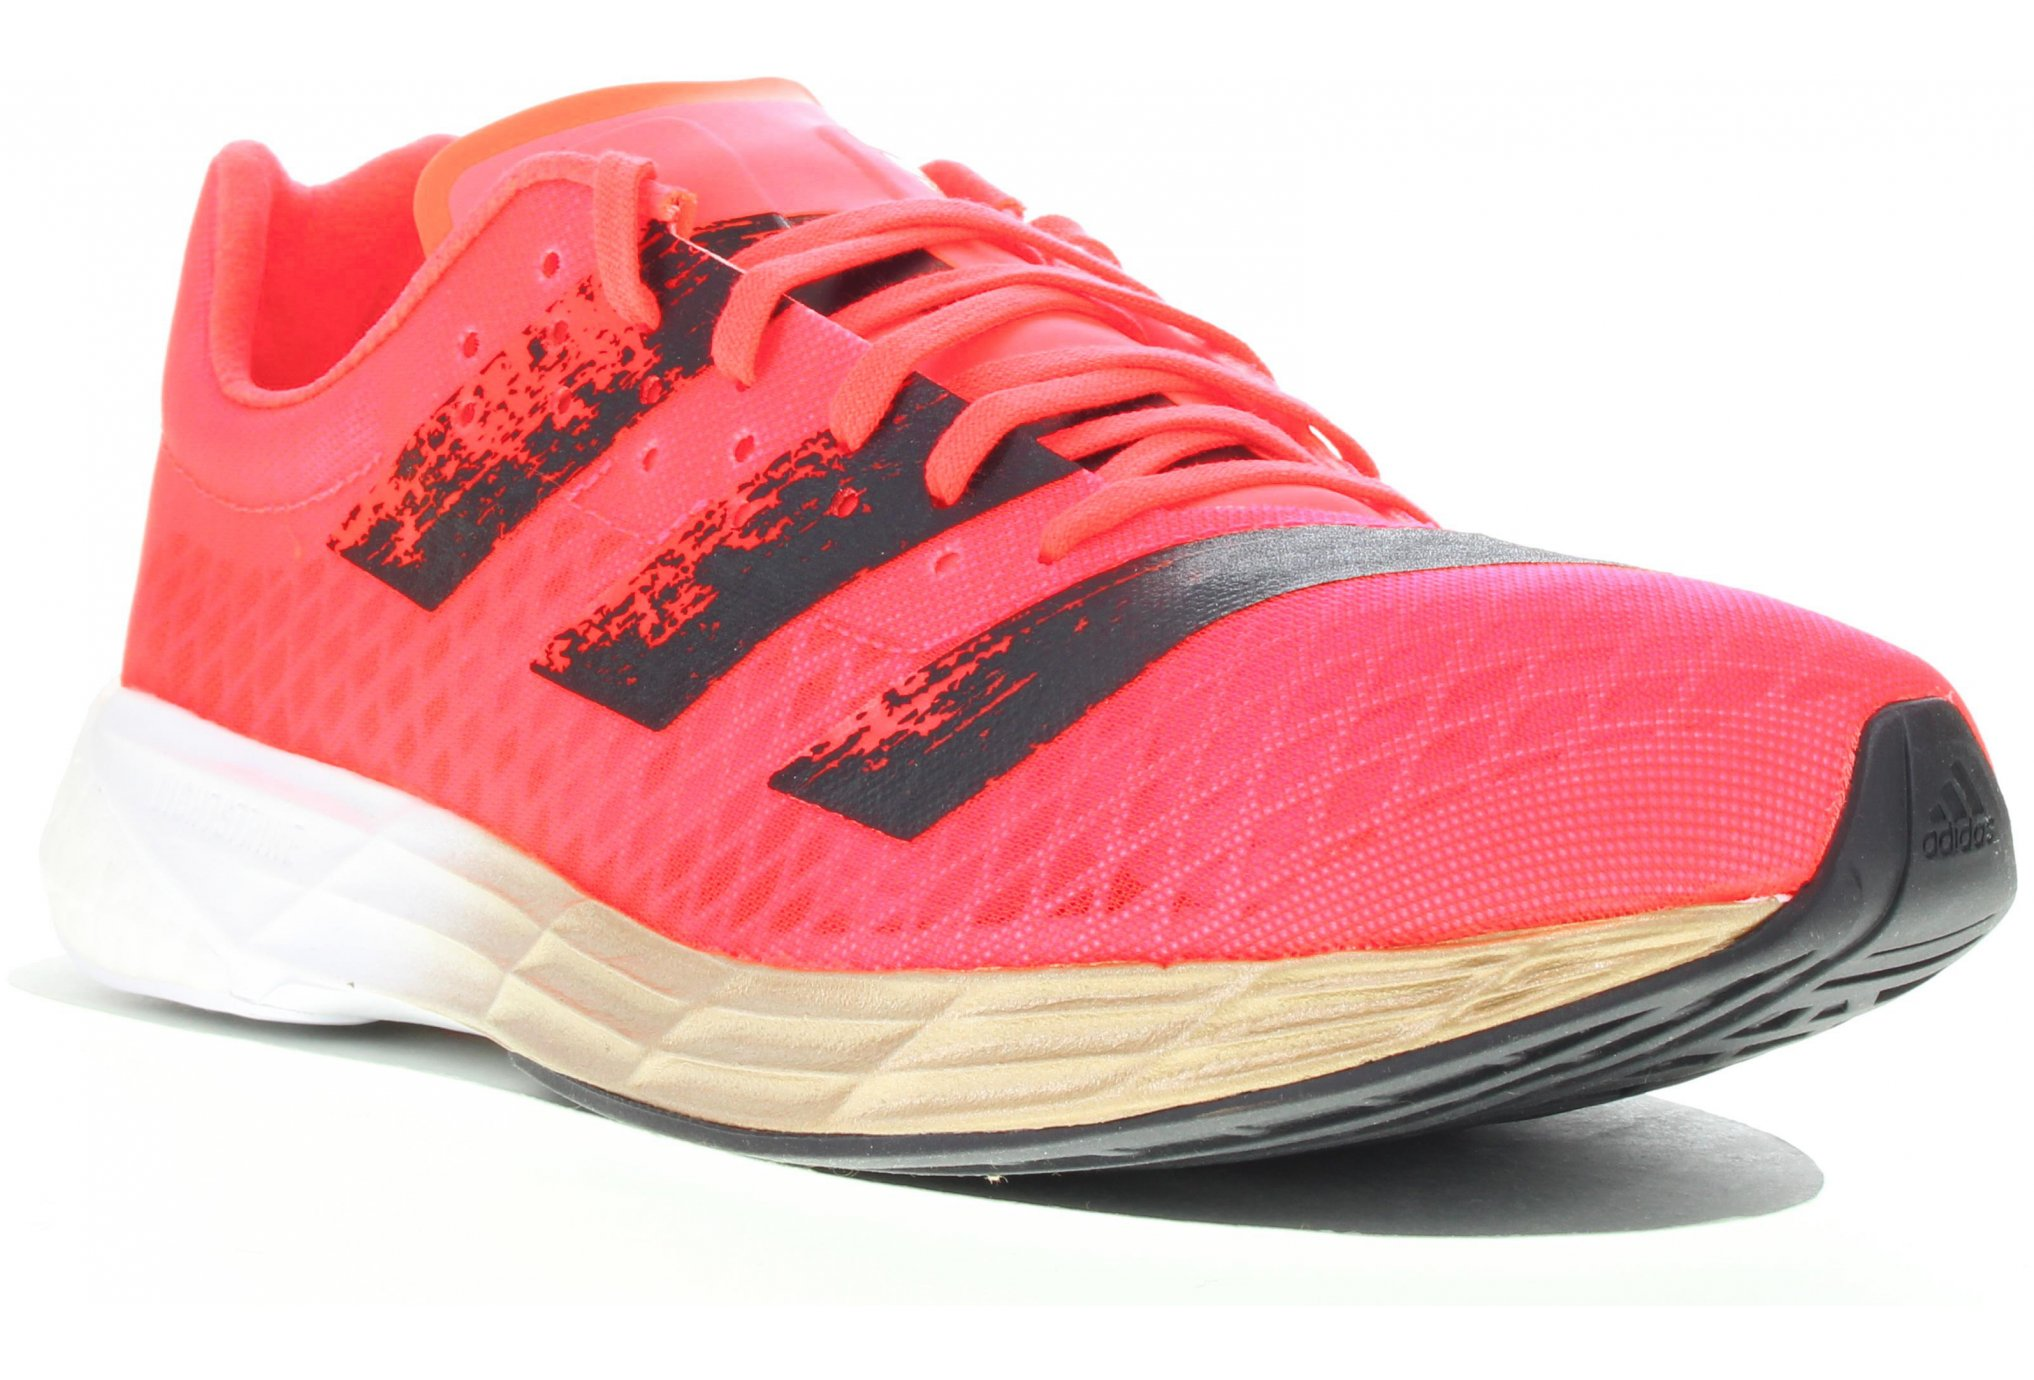 adidas adizero Pro Chaussures running femme